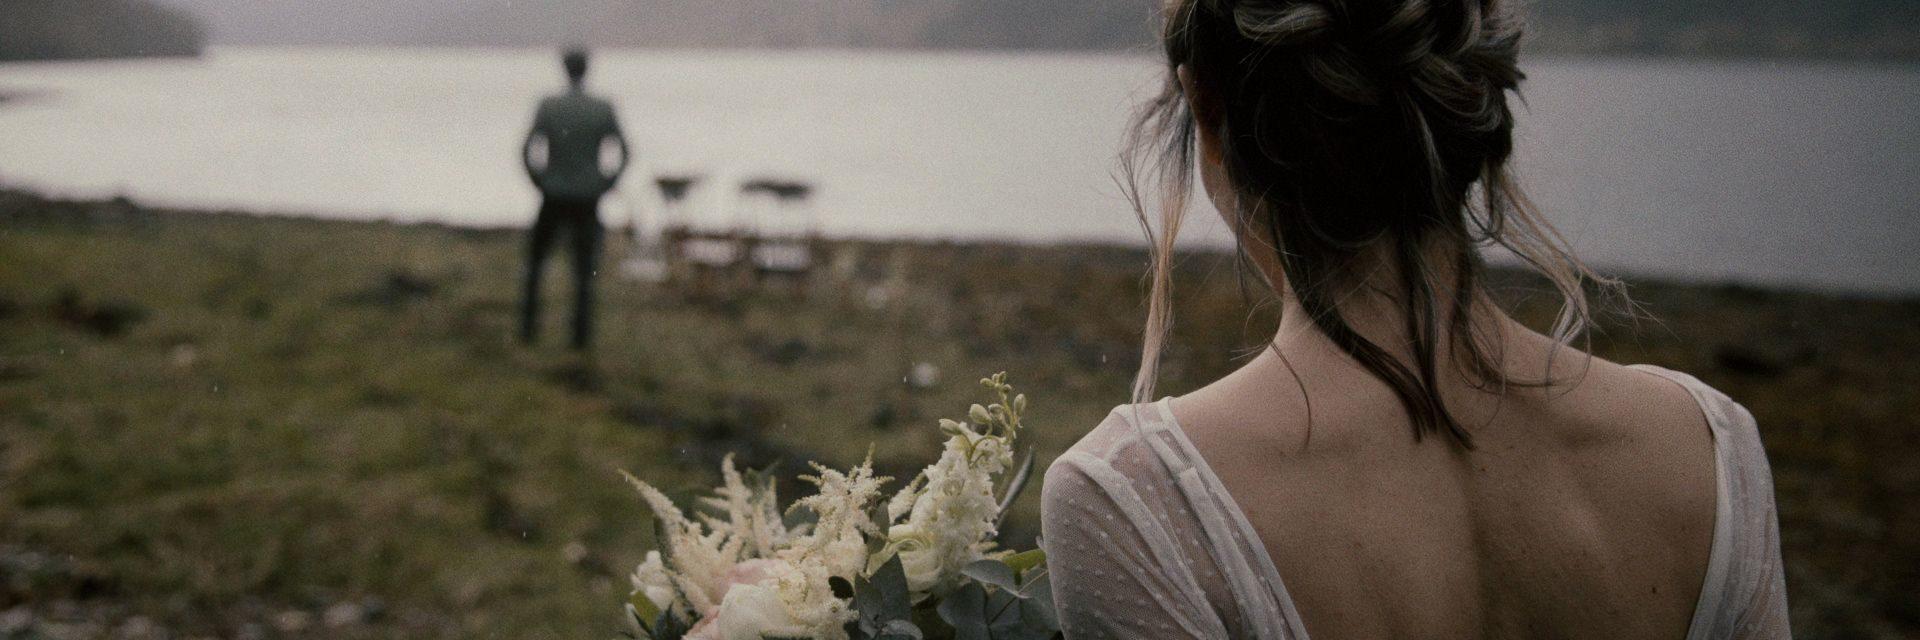 Lindos-wedding-videographer-cinemate-films-02